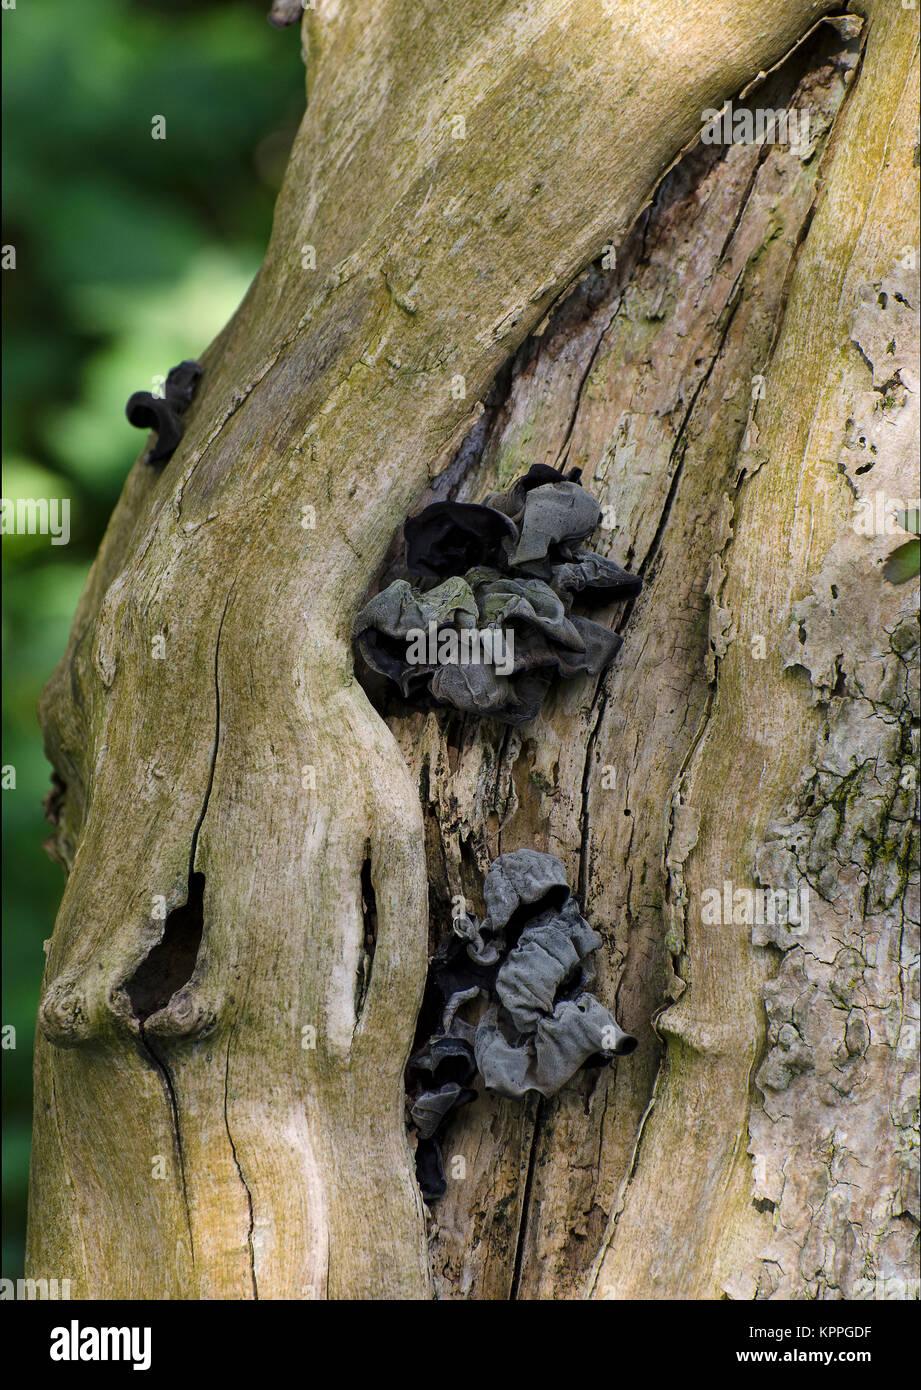 Black witches' butter, fungus, Exidia glandulosa, Exidia truncata, fruiting on dead tree, Lancashire, UK - Stock Image